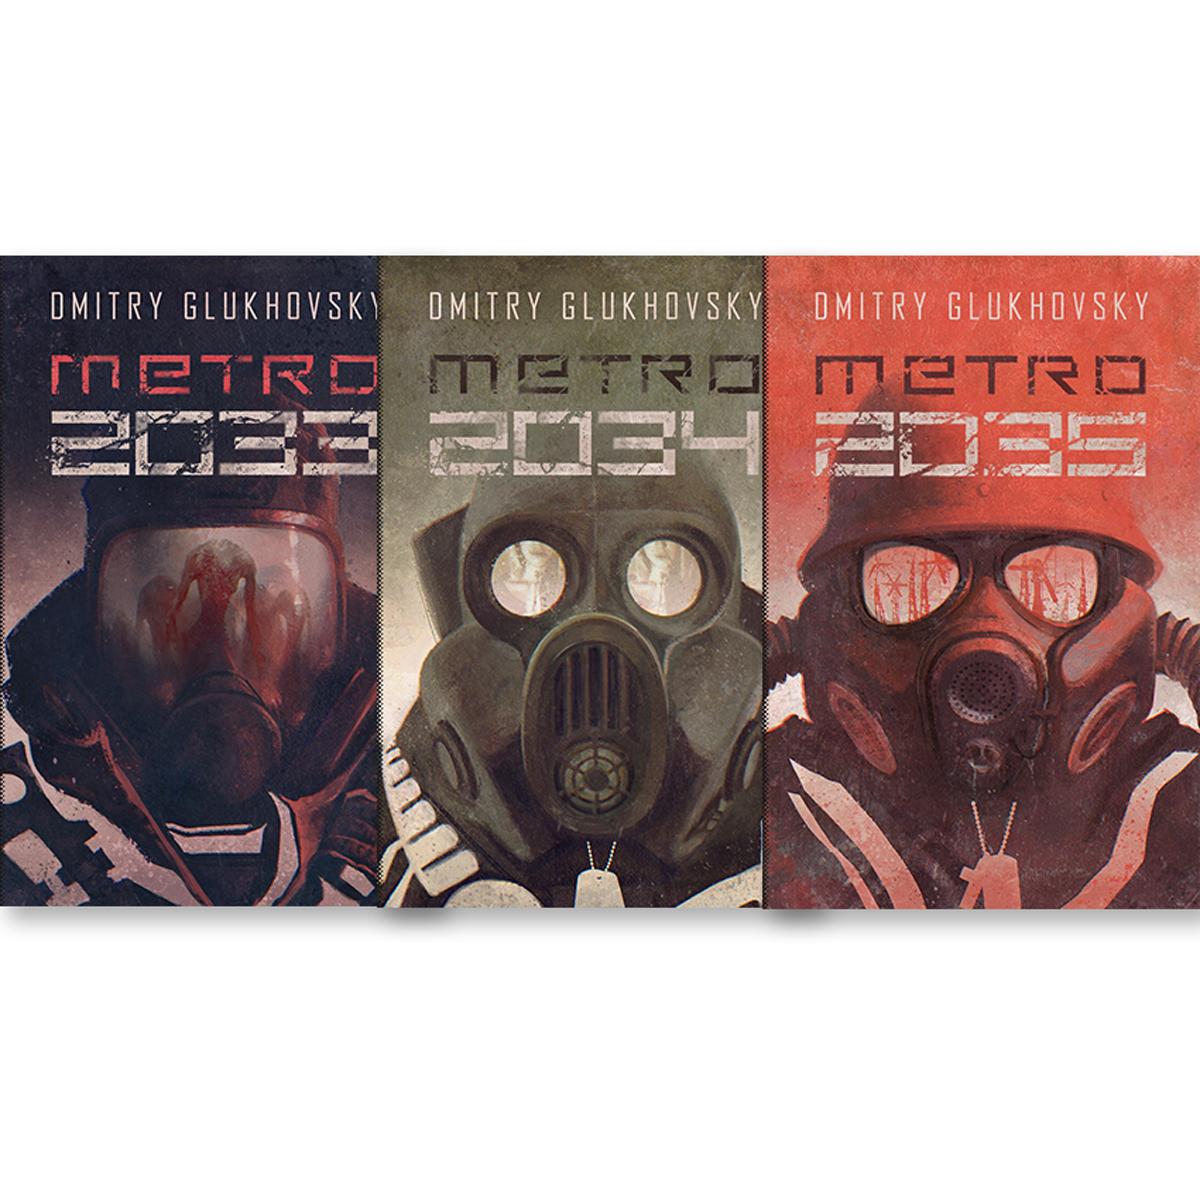 Trylogia Metro 2033, 2034, 2035 oraz seria Assassin's Creed w dobrej cenie